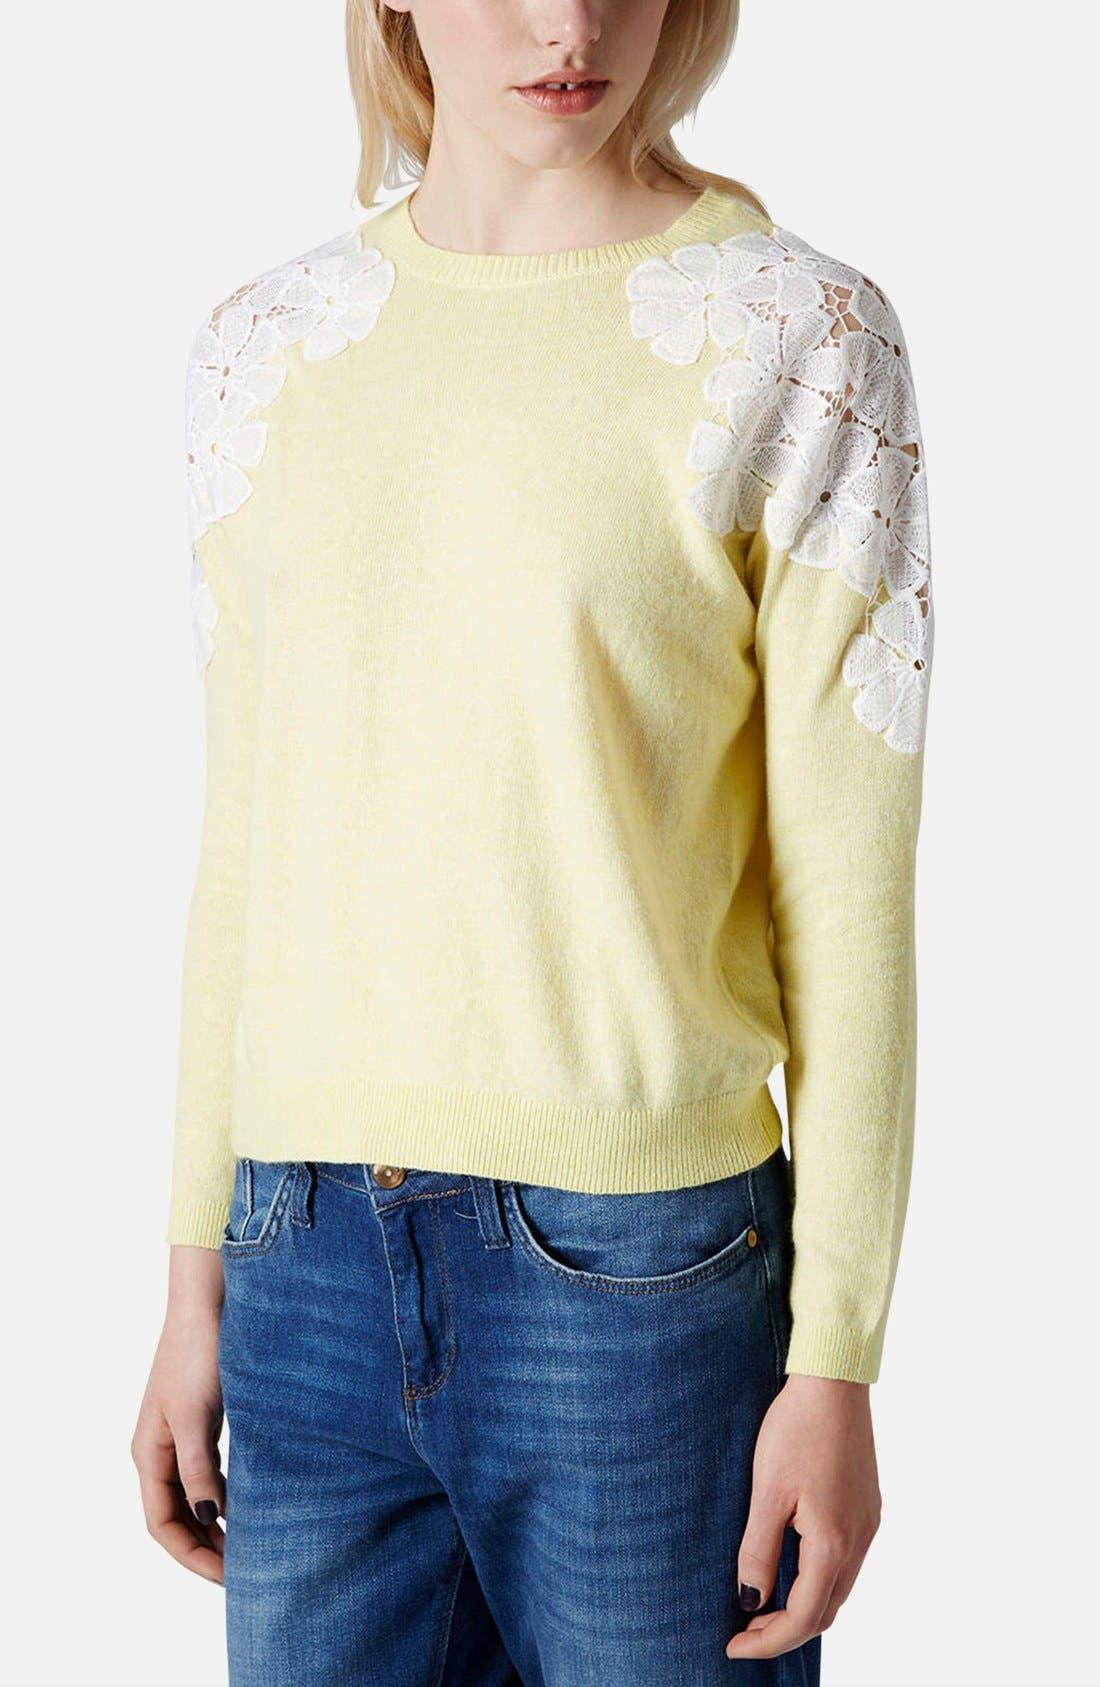 Alternate Image 1 Selected - Topshop Embroidered Shoulder Knit Sweater